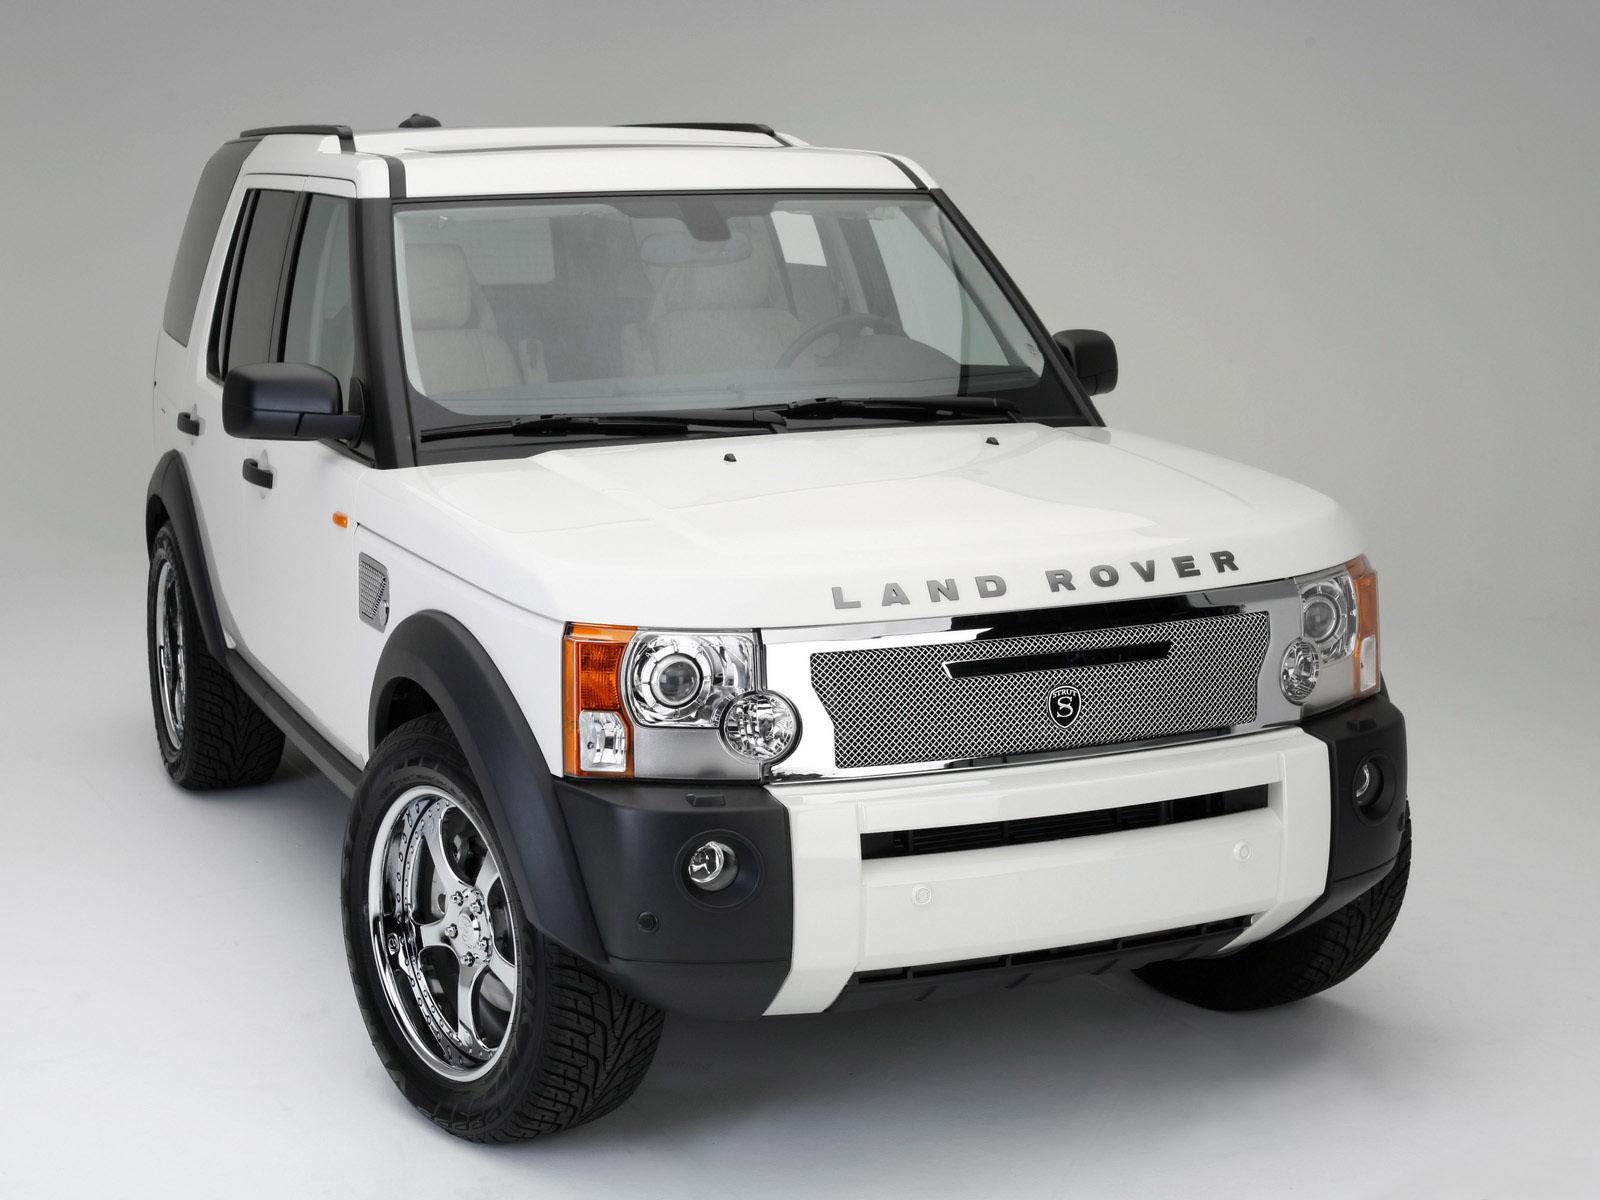 2008 Strut Land Rover LR3 Kensington